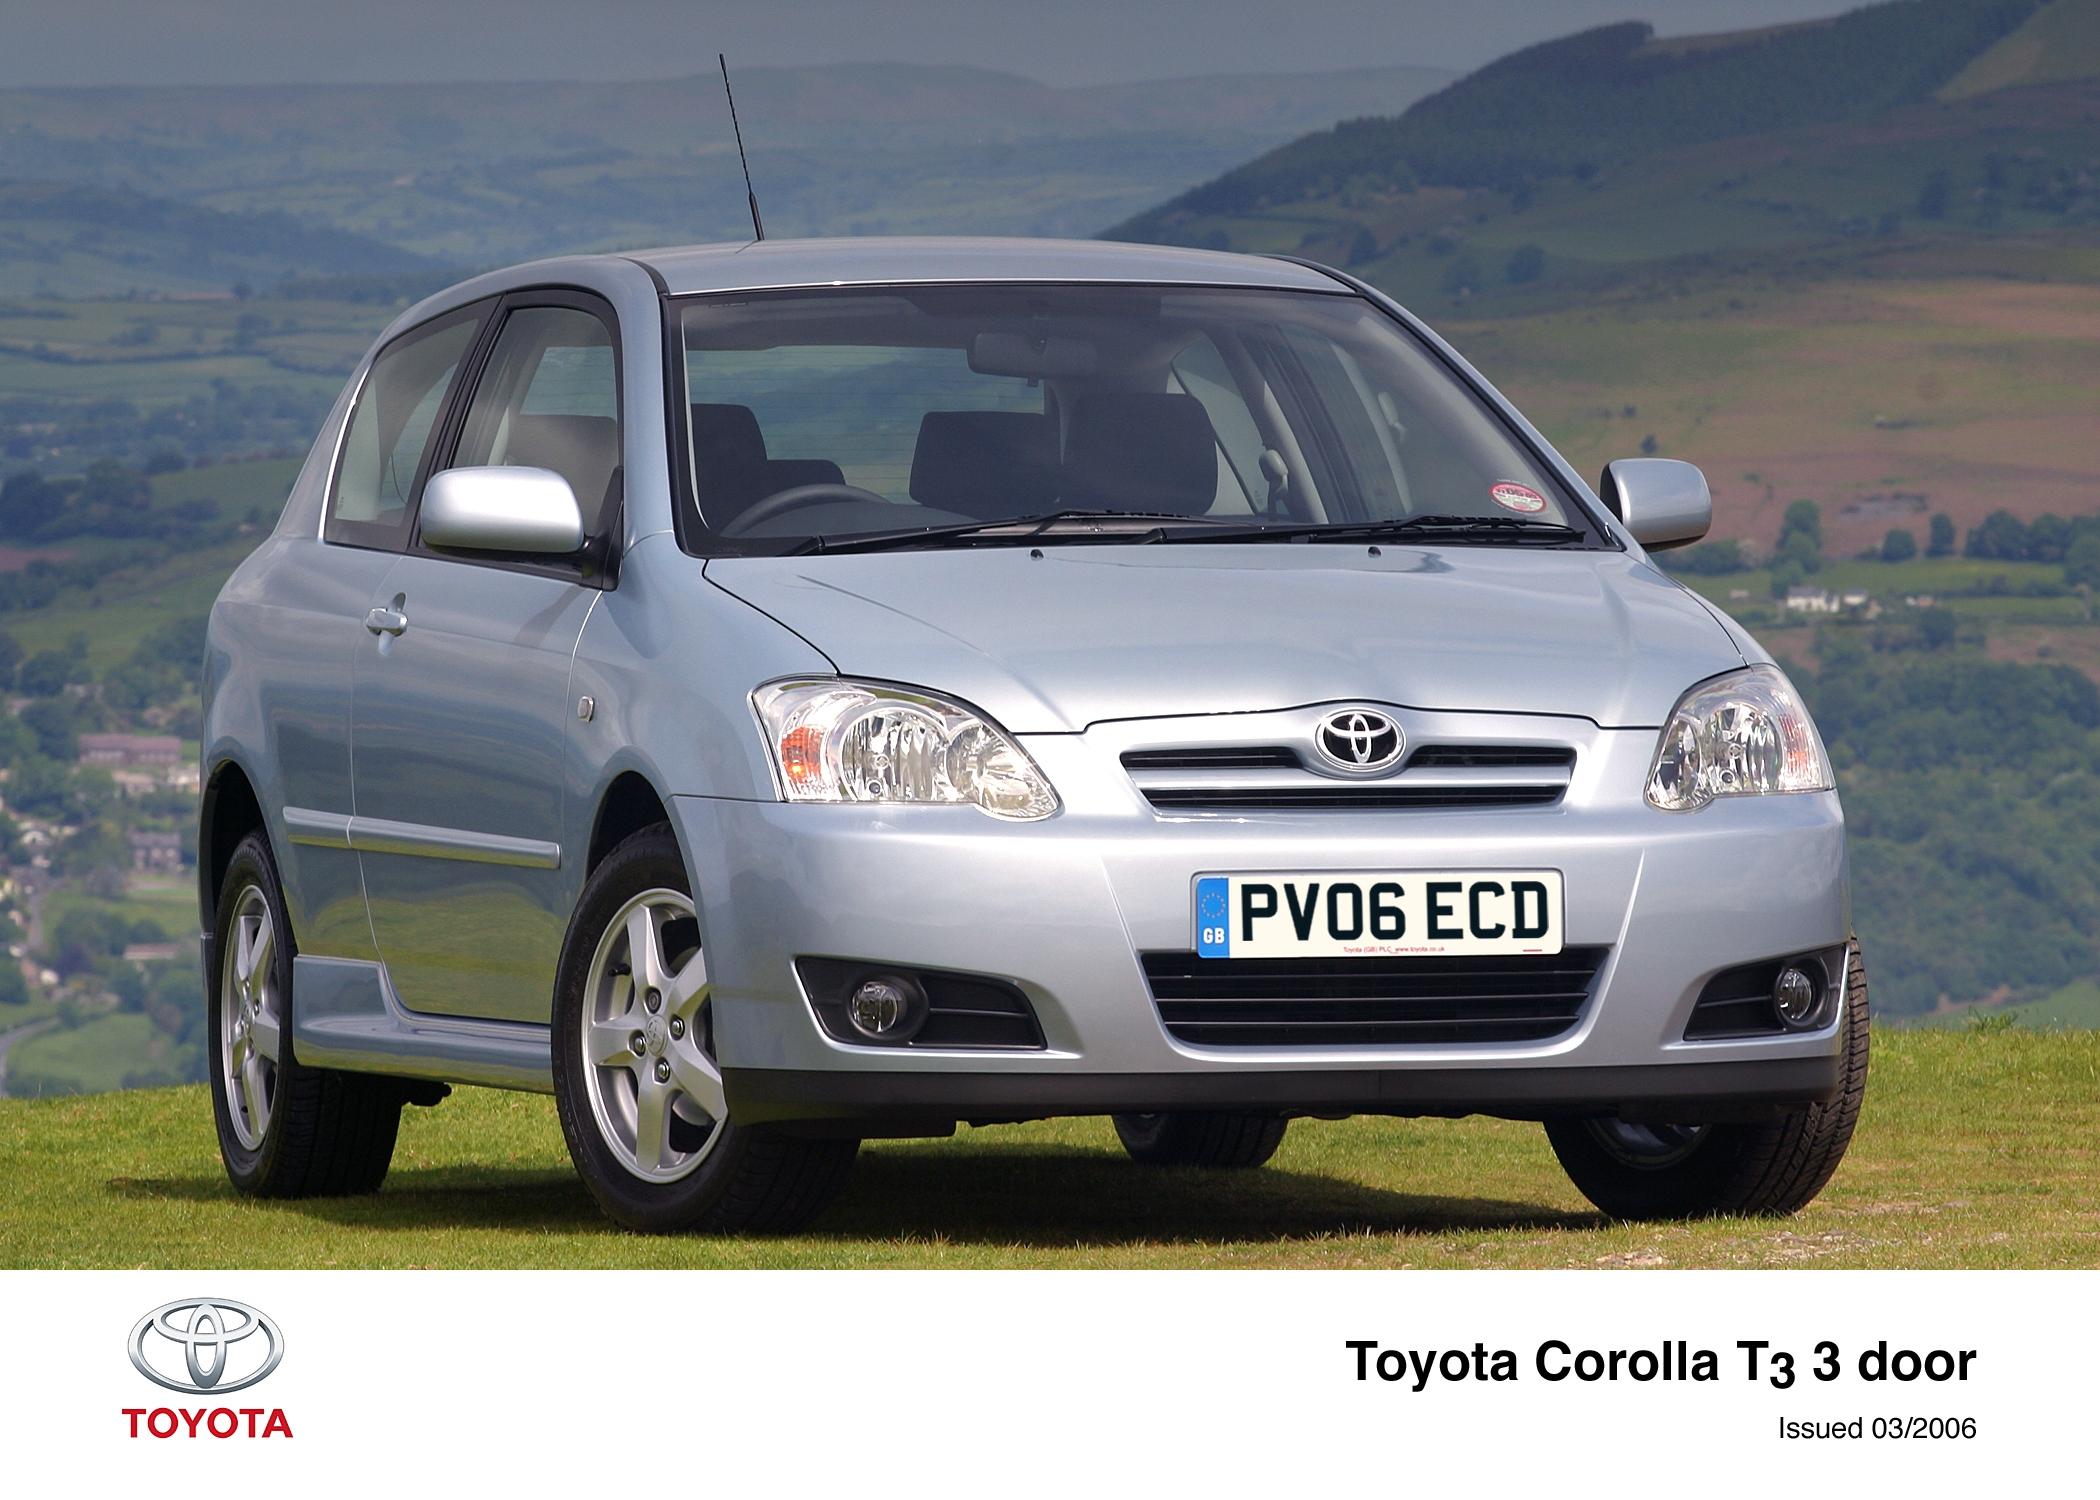 Toyota Corolla IX (E120, E130) Restyling 2004 - 2007 Hatchback 3 door #3